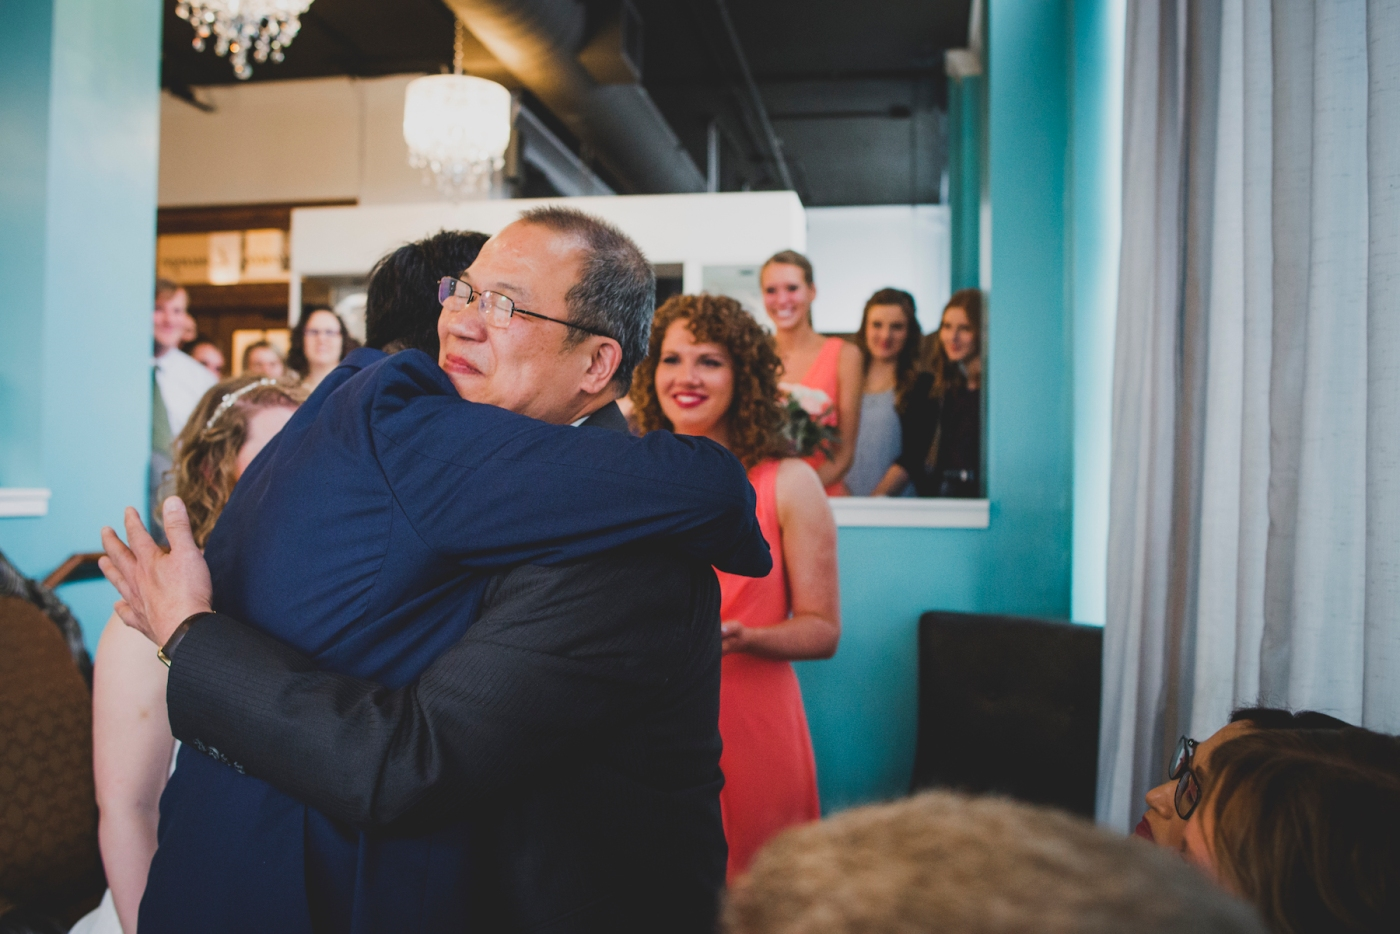 DSC_2983Everett_Wedding_Ballroom_Jane_Speleers_photography_Rachel_and_Edmund_teaceremony_2017